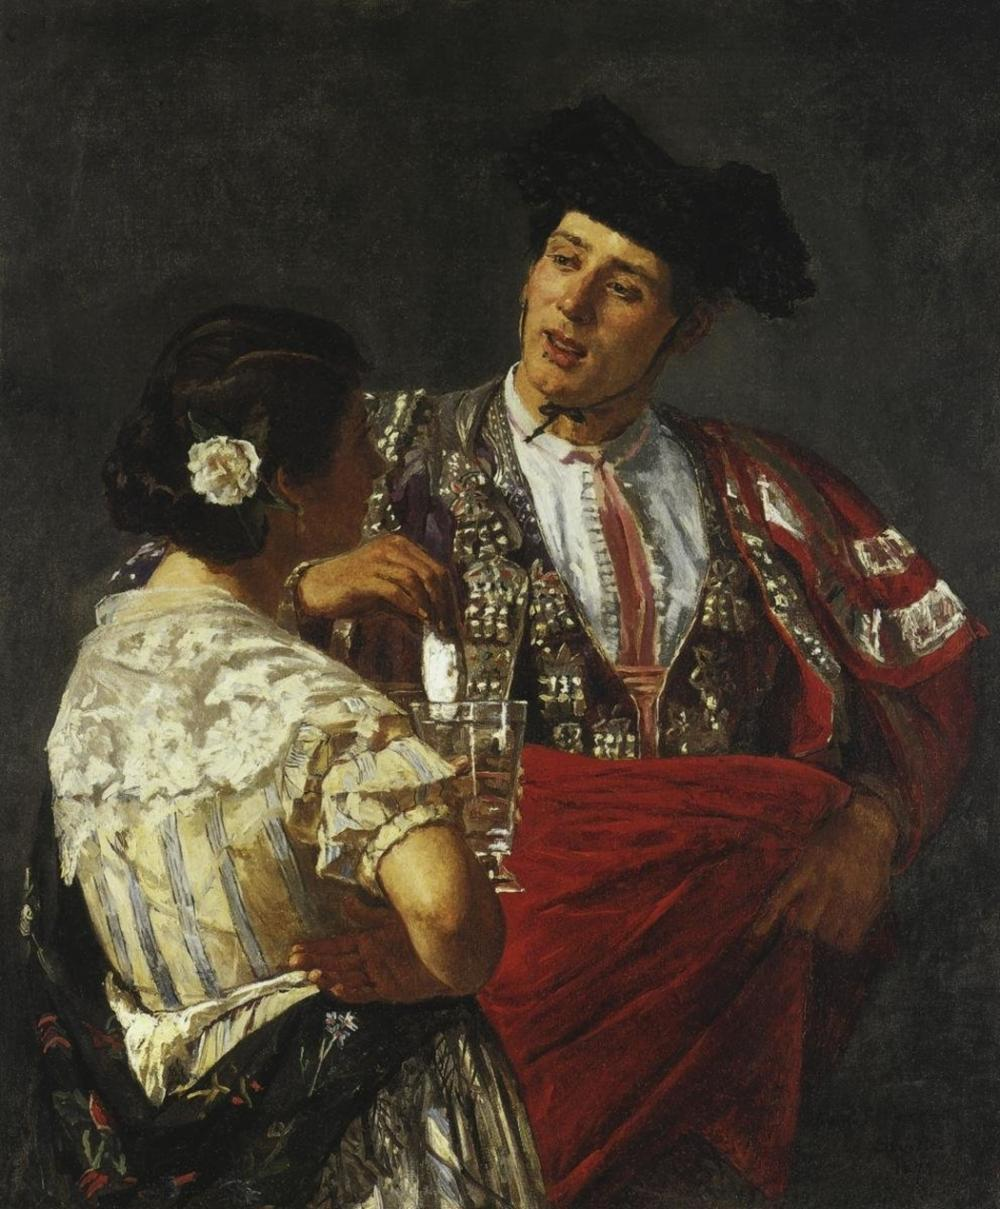 MARY CASSATT - OFFERING THE PANAL TO THE BULLFIGHTER 1872